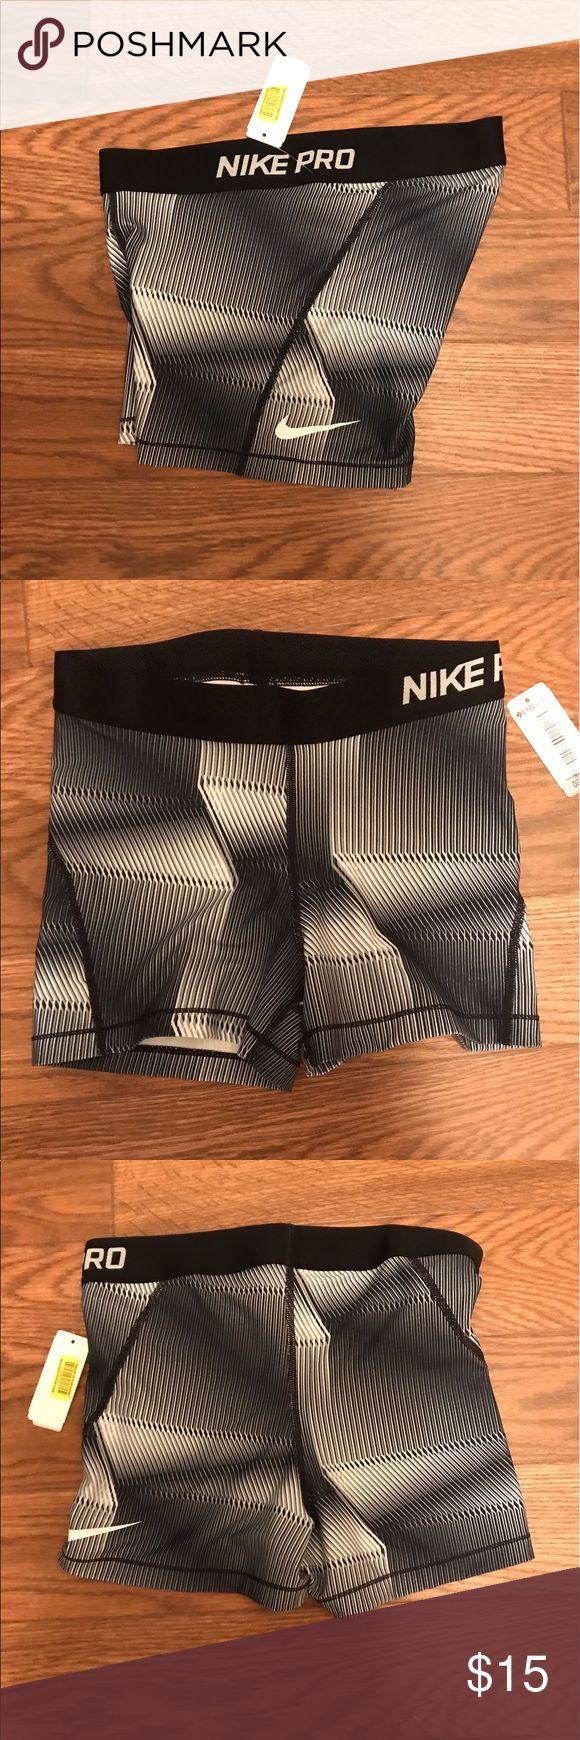 Nike dri fit shorts Nike dri fit shorts. NWT . Size XL and has all original tags Nike Shorts